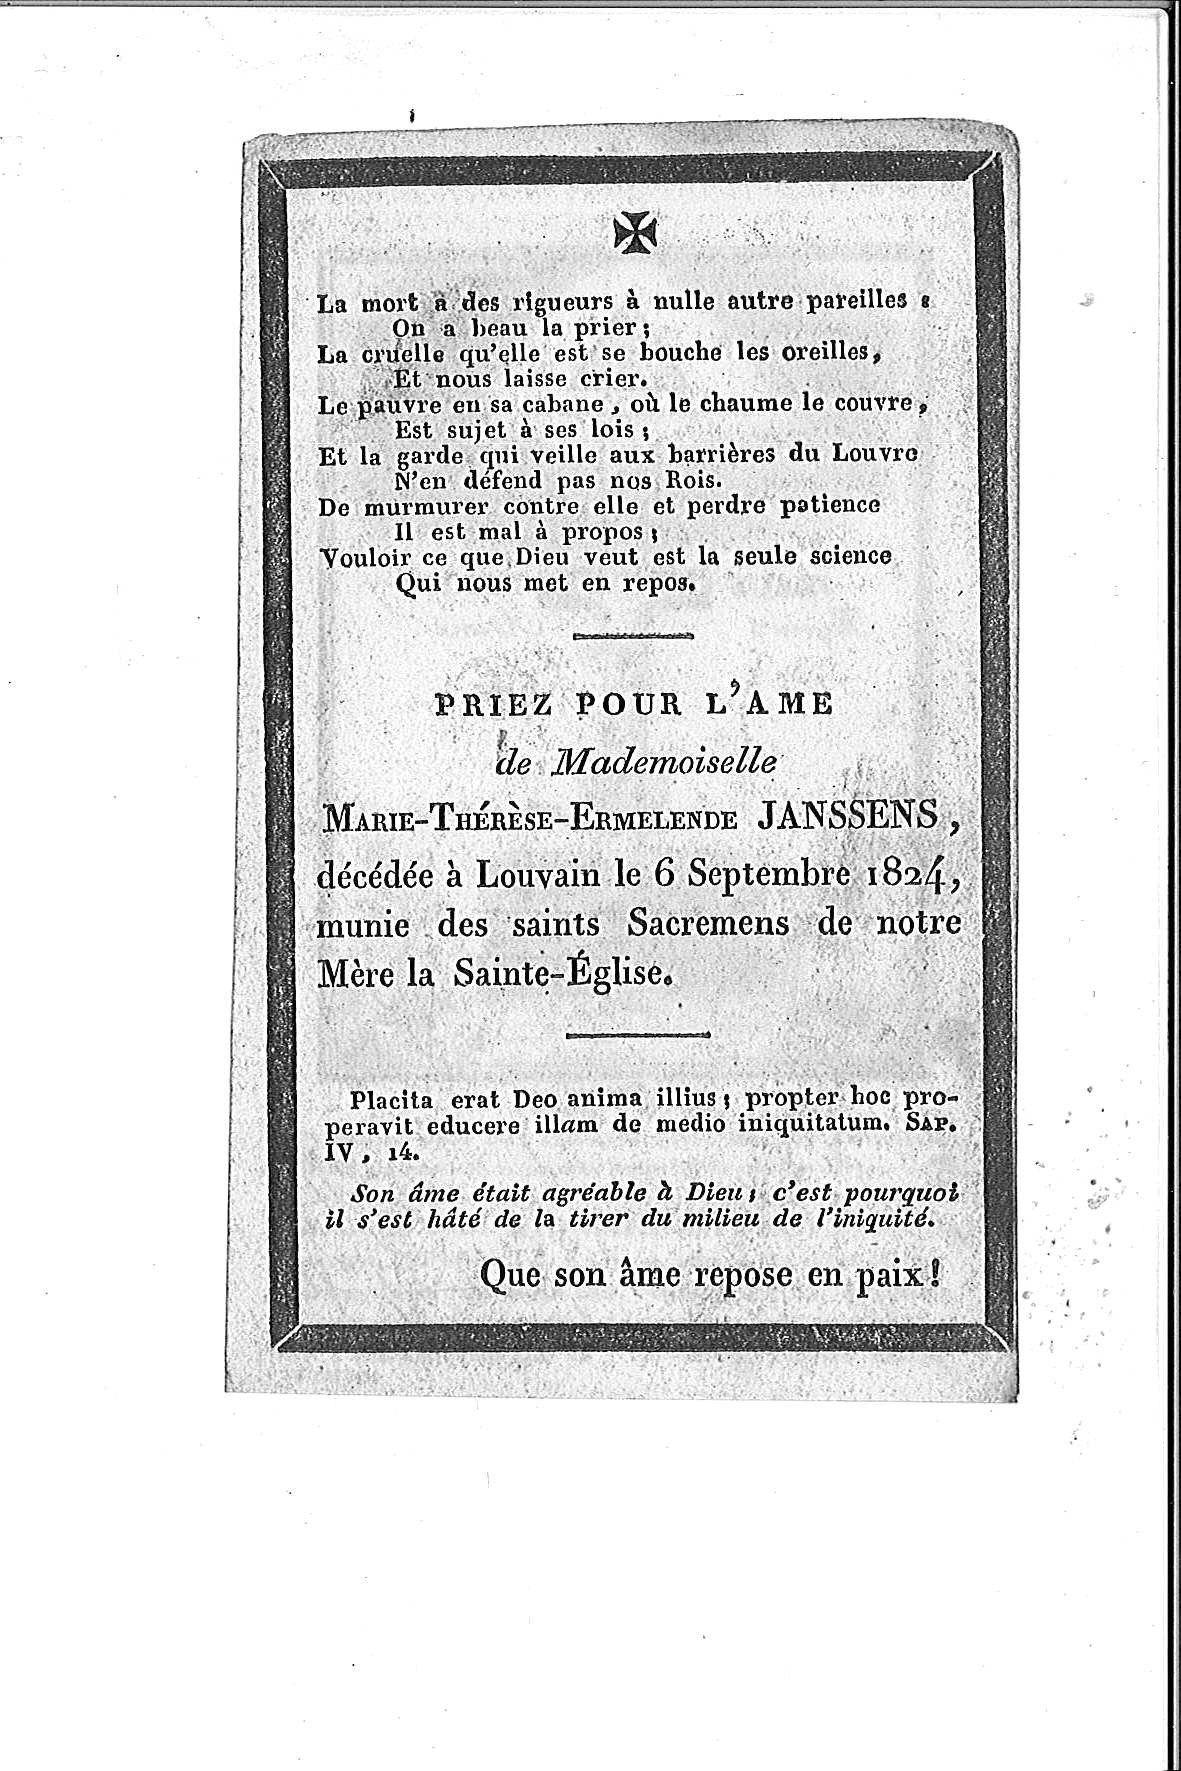 Marie-Thérèse-Ermelende(1824)20150504094827_00025.jpg